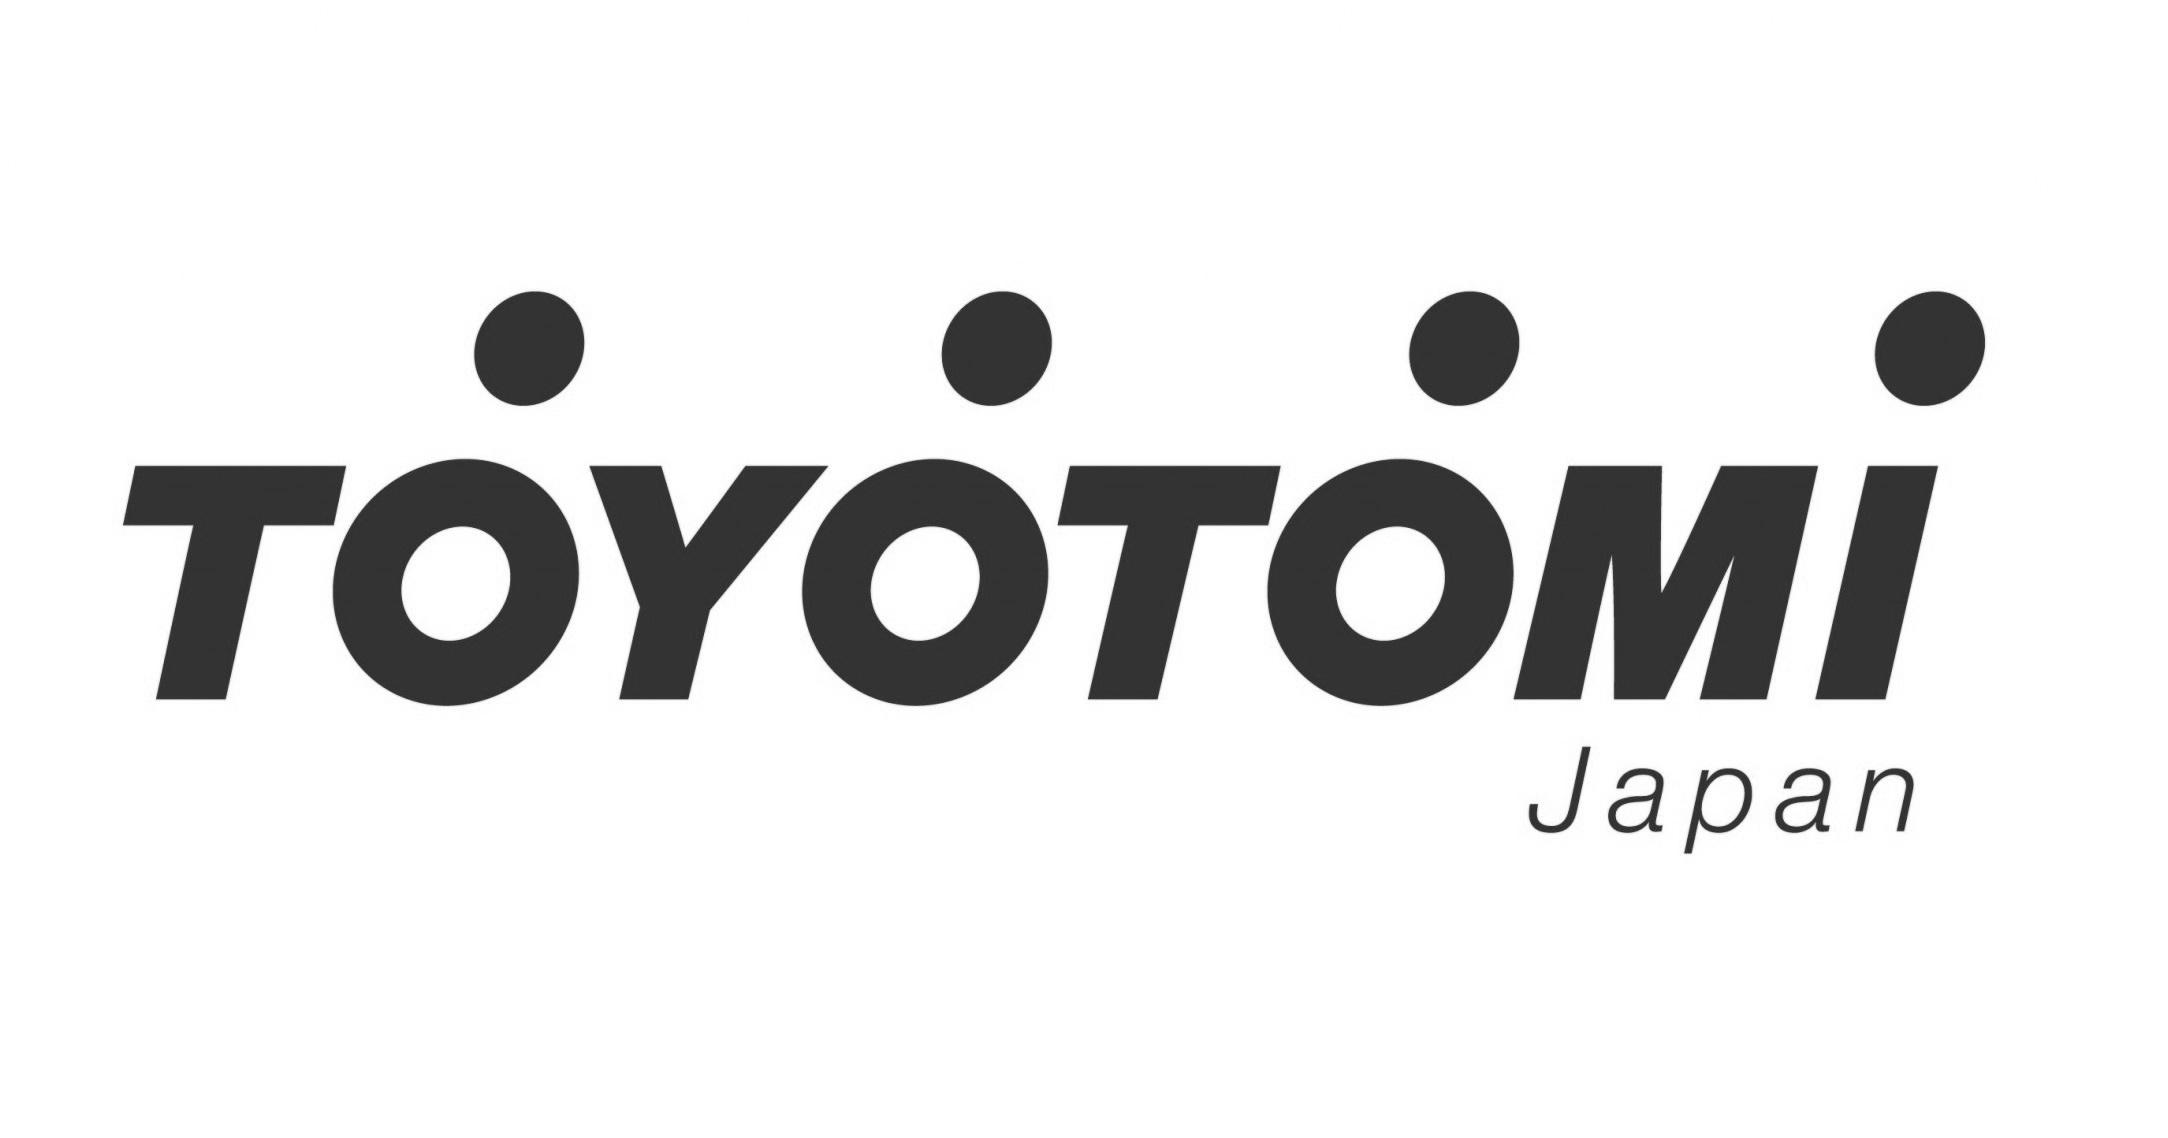 Toyotomi Japan